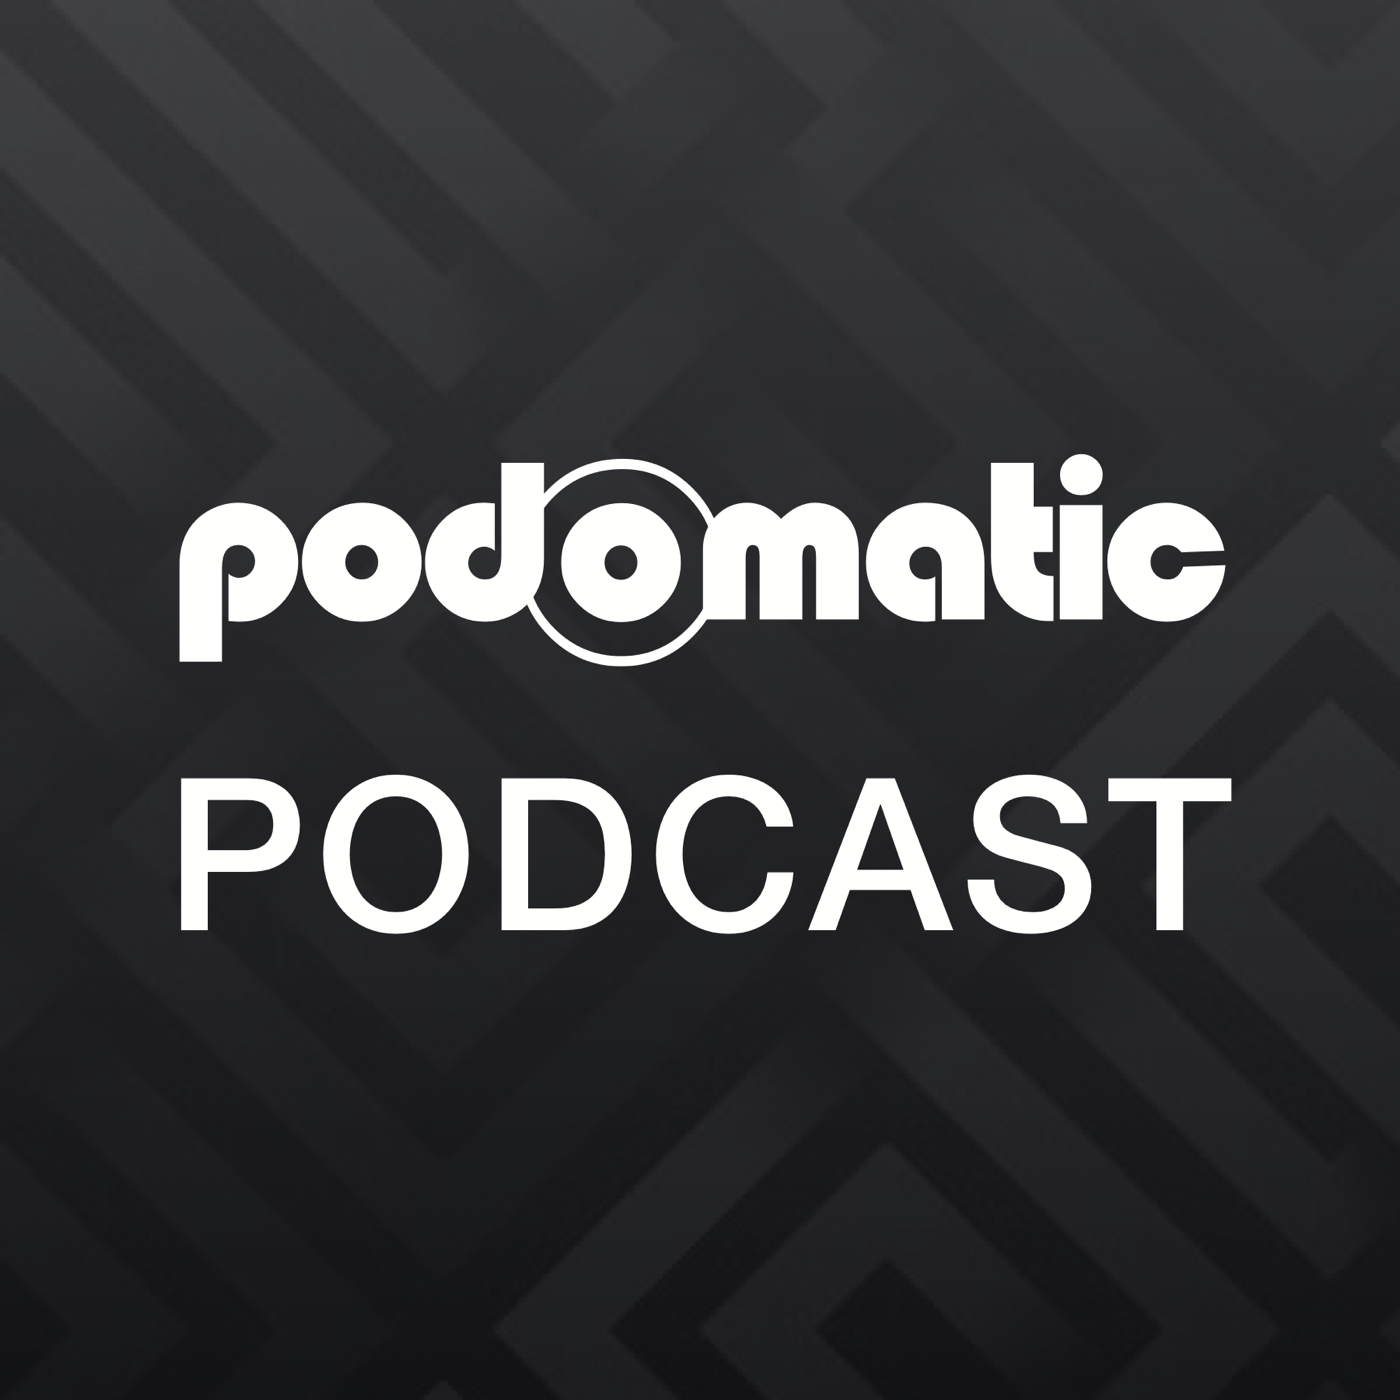 Herald_DUB's Podcast